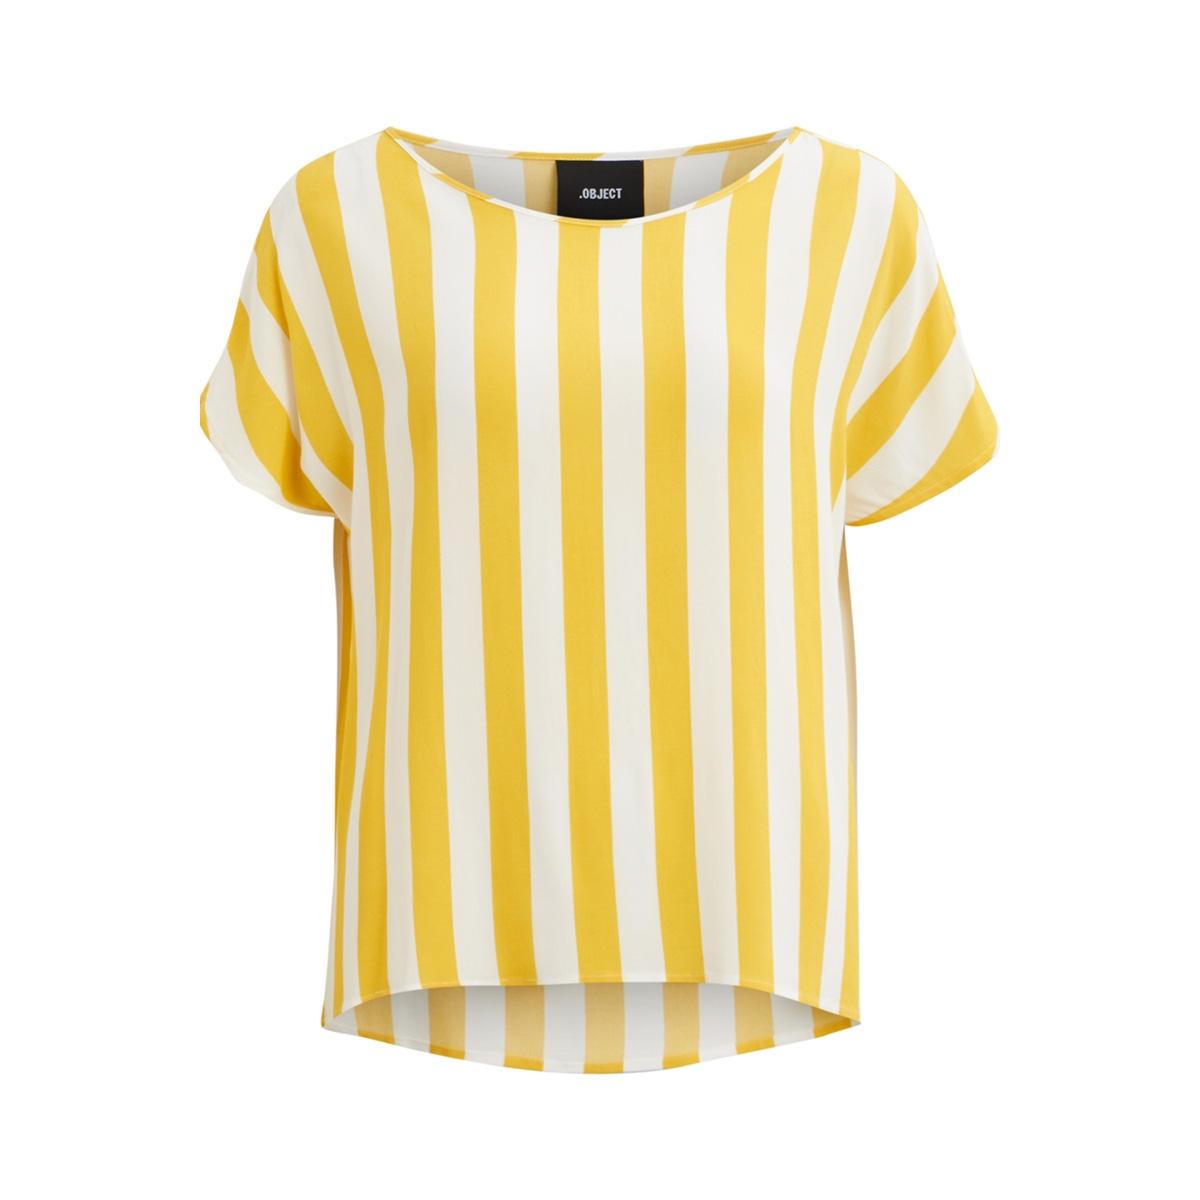 objbay s/s urban top aop seasonal 23028784 object t-shirt maize/w. white s